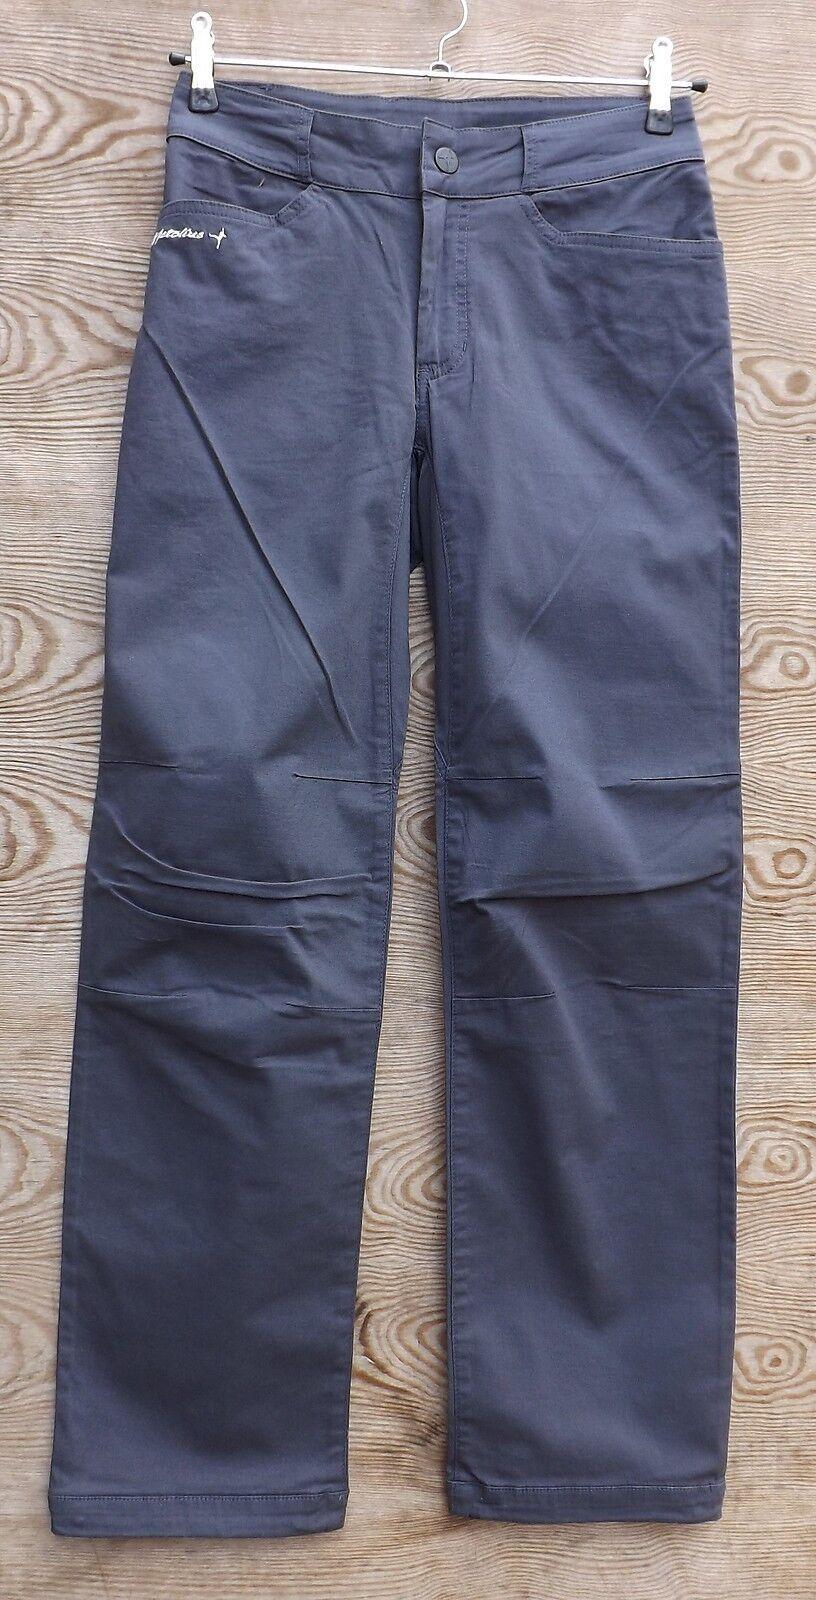 Metolius Boulder Pant V16 Men, Climbing Pants for Men,  Grey  buy cheap new